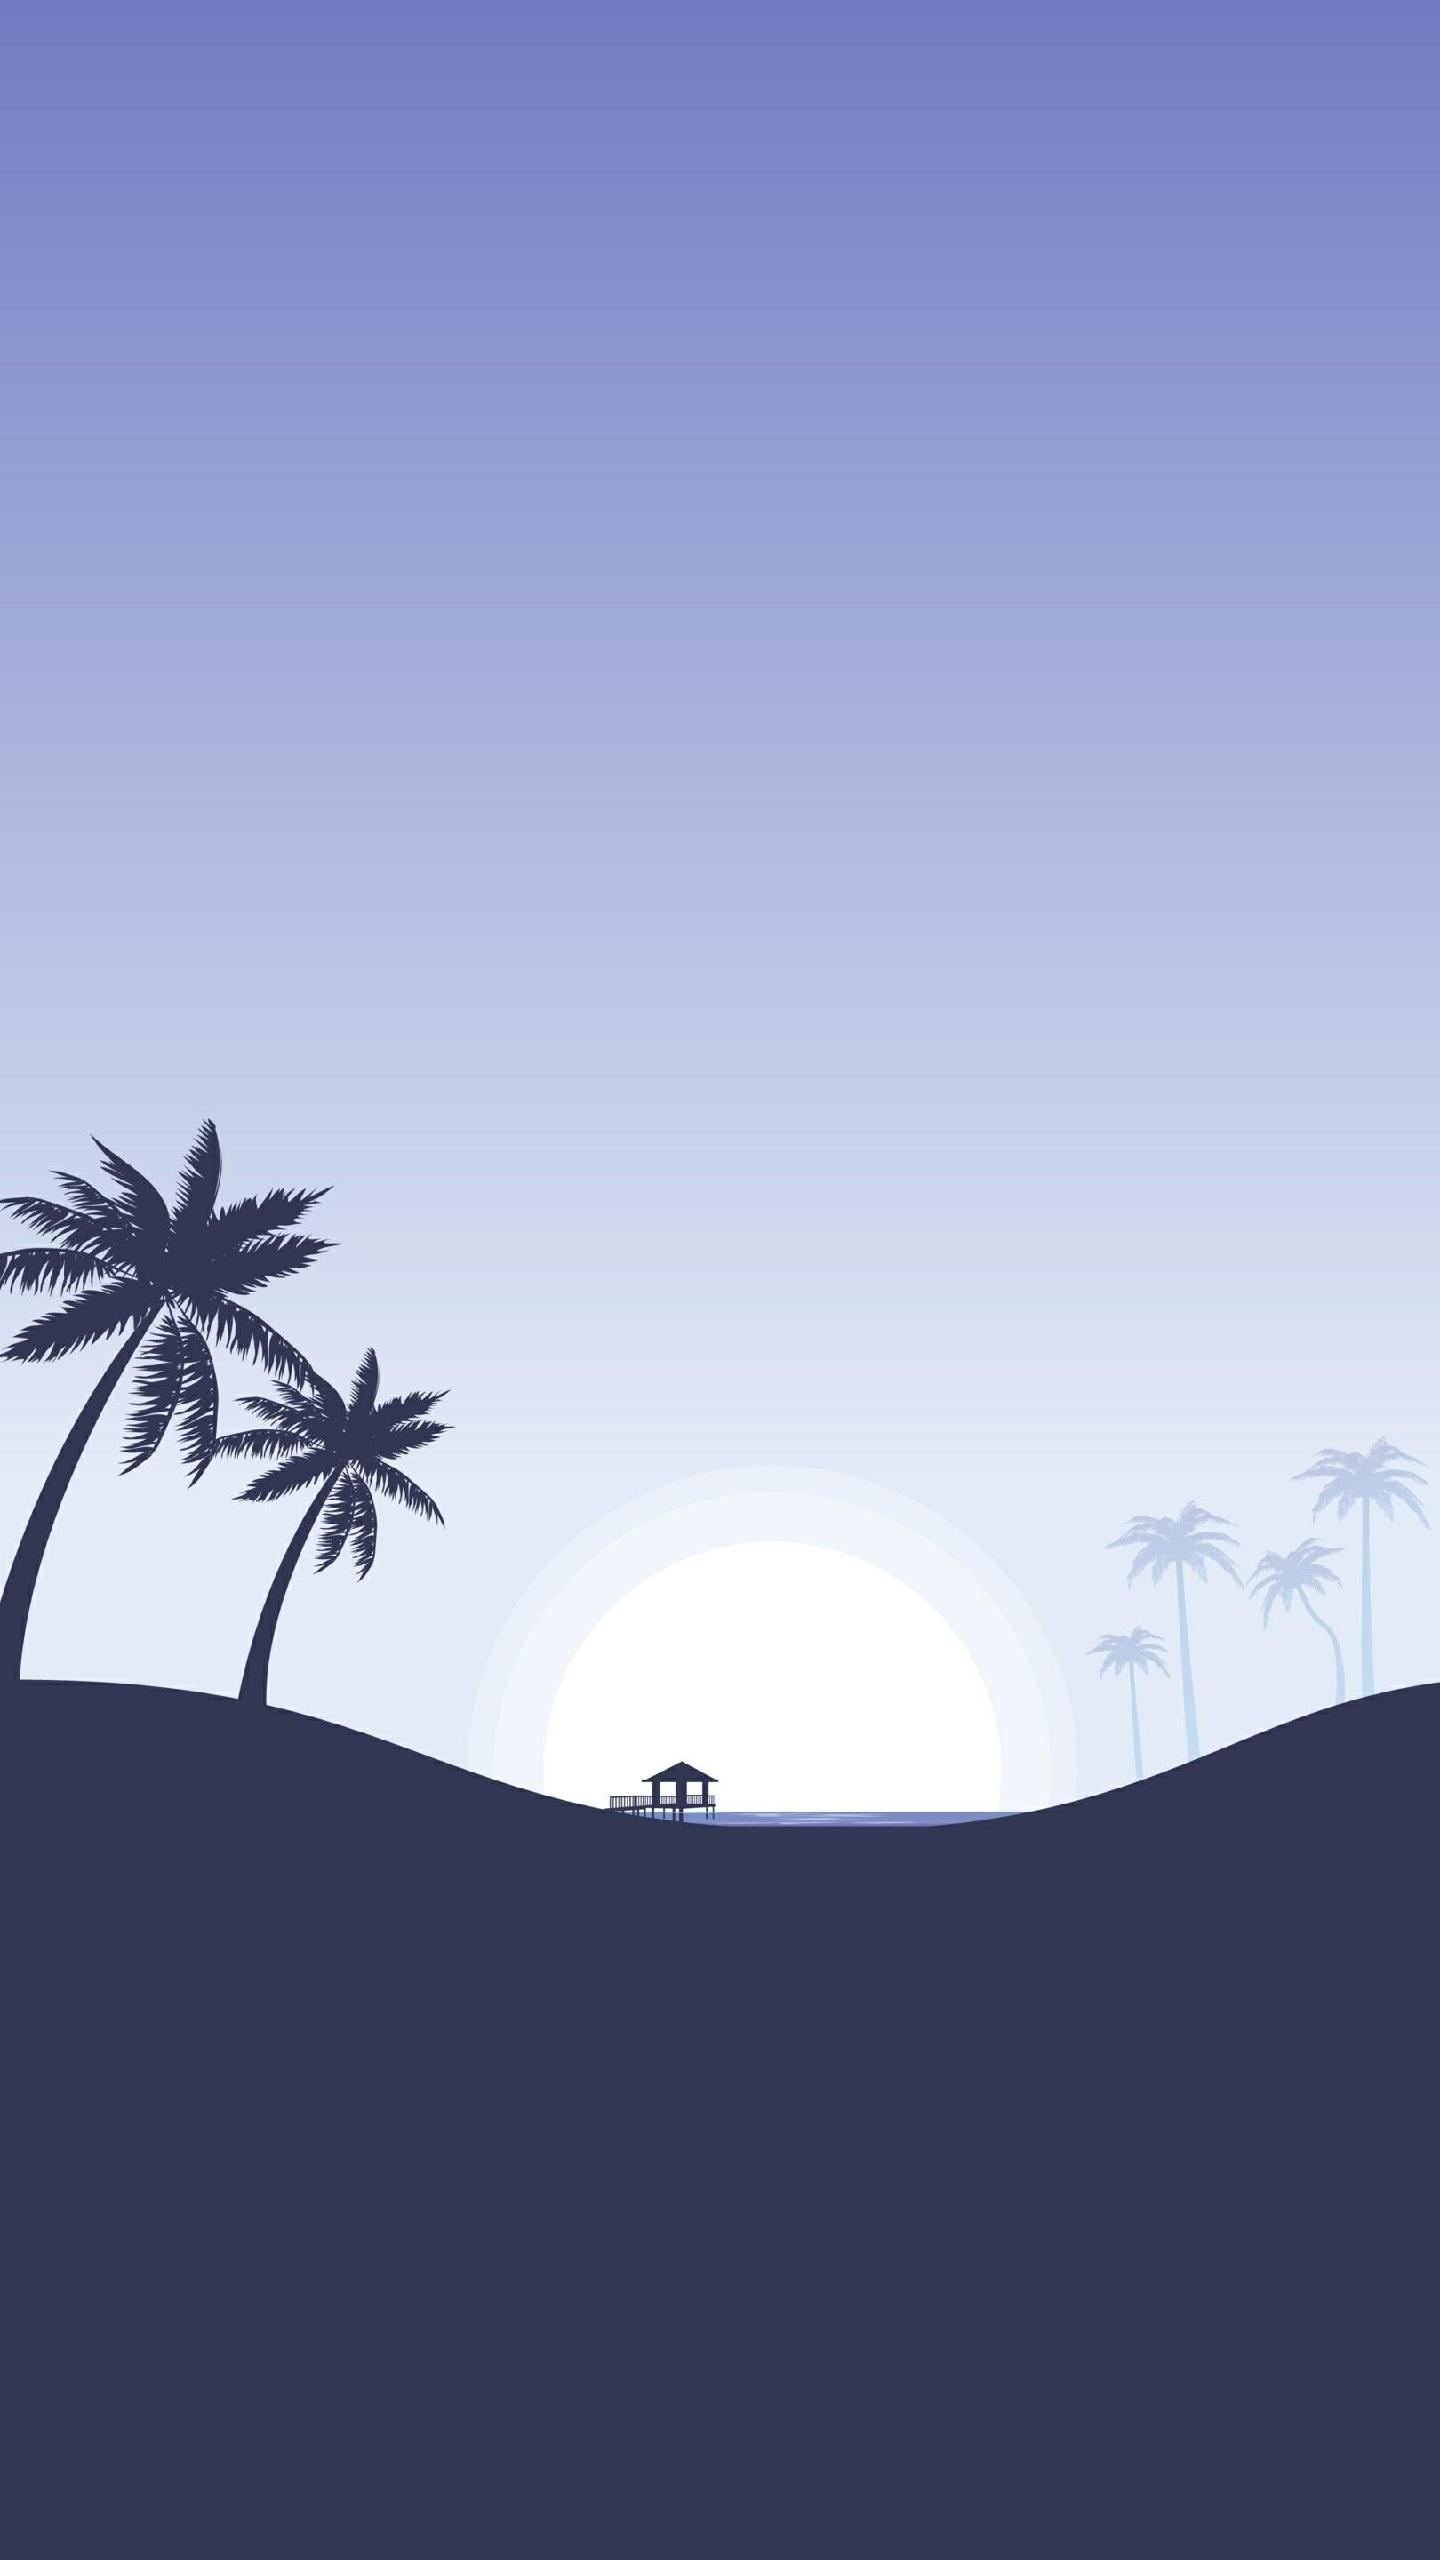 Landscape Minimal Background Hd Wallpaper